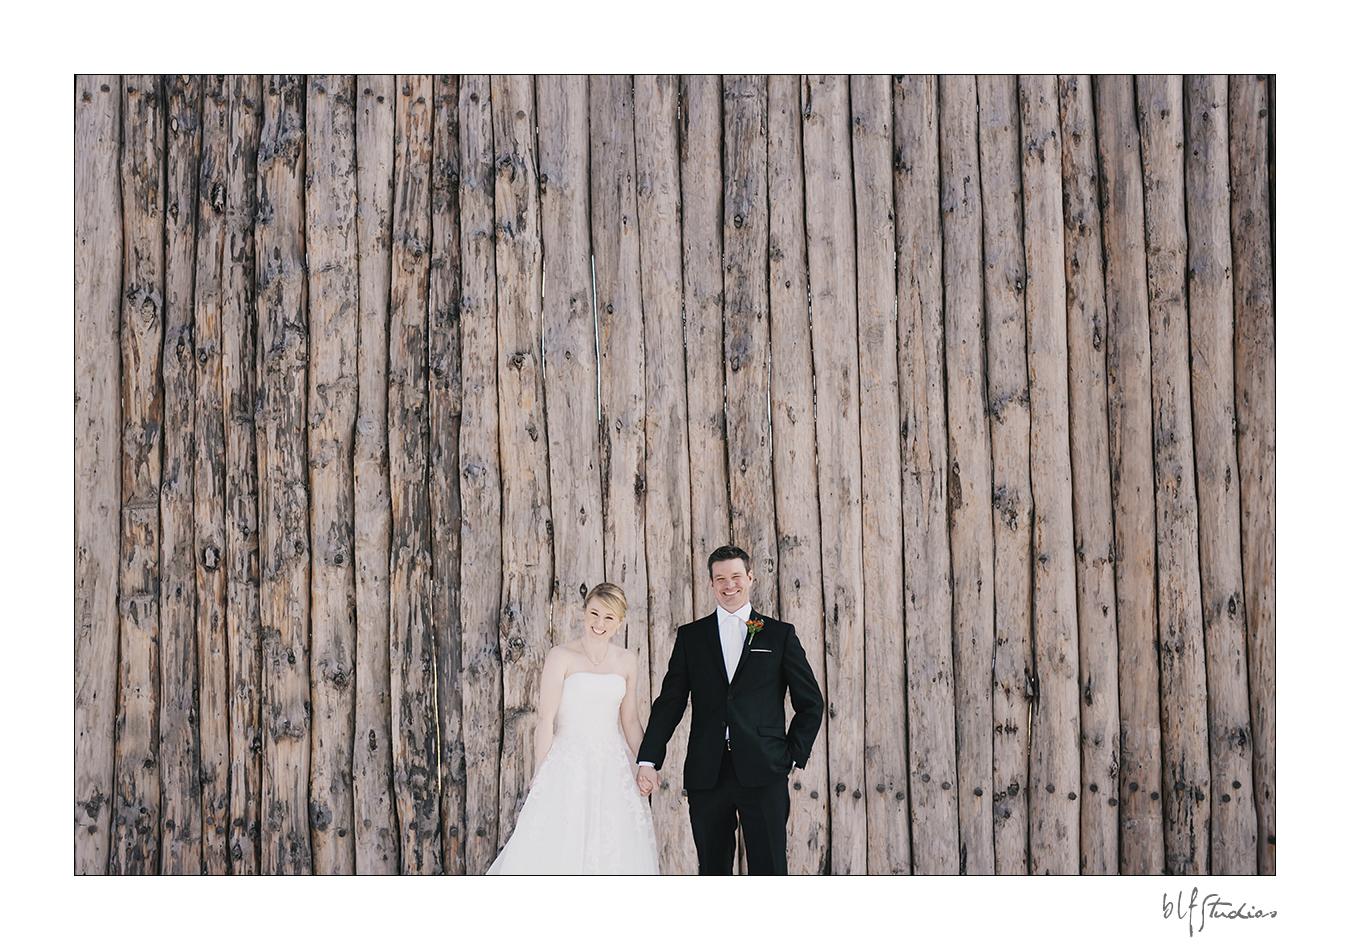 Winter wedding at Fort Gibraltar Winnipeg Bride Groom